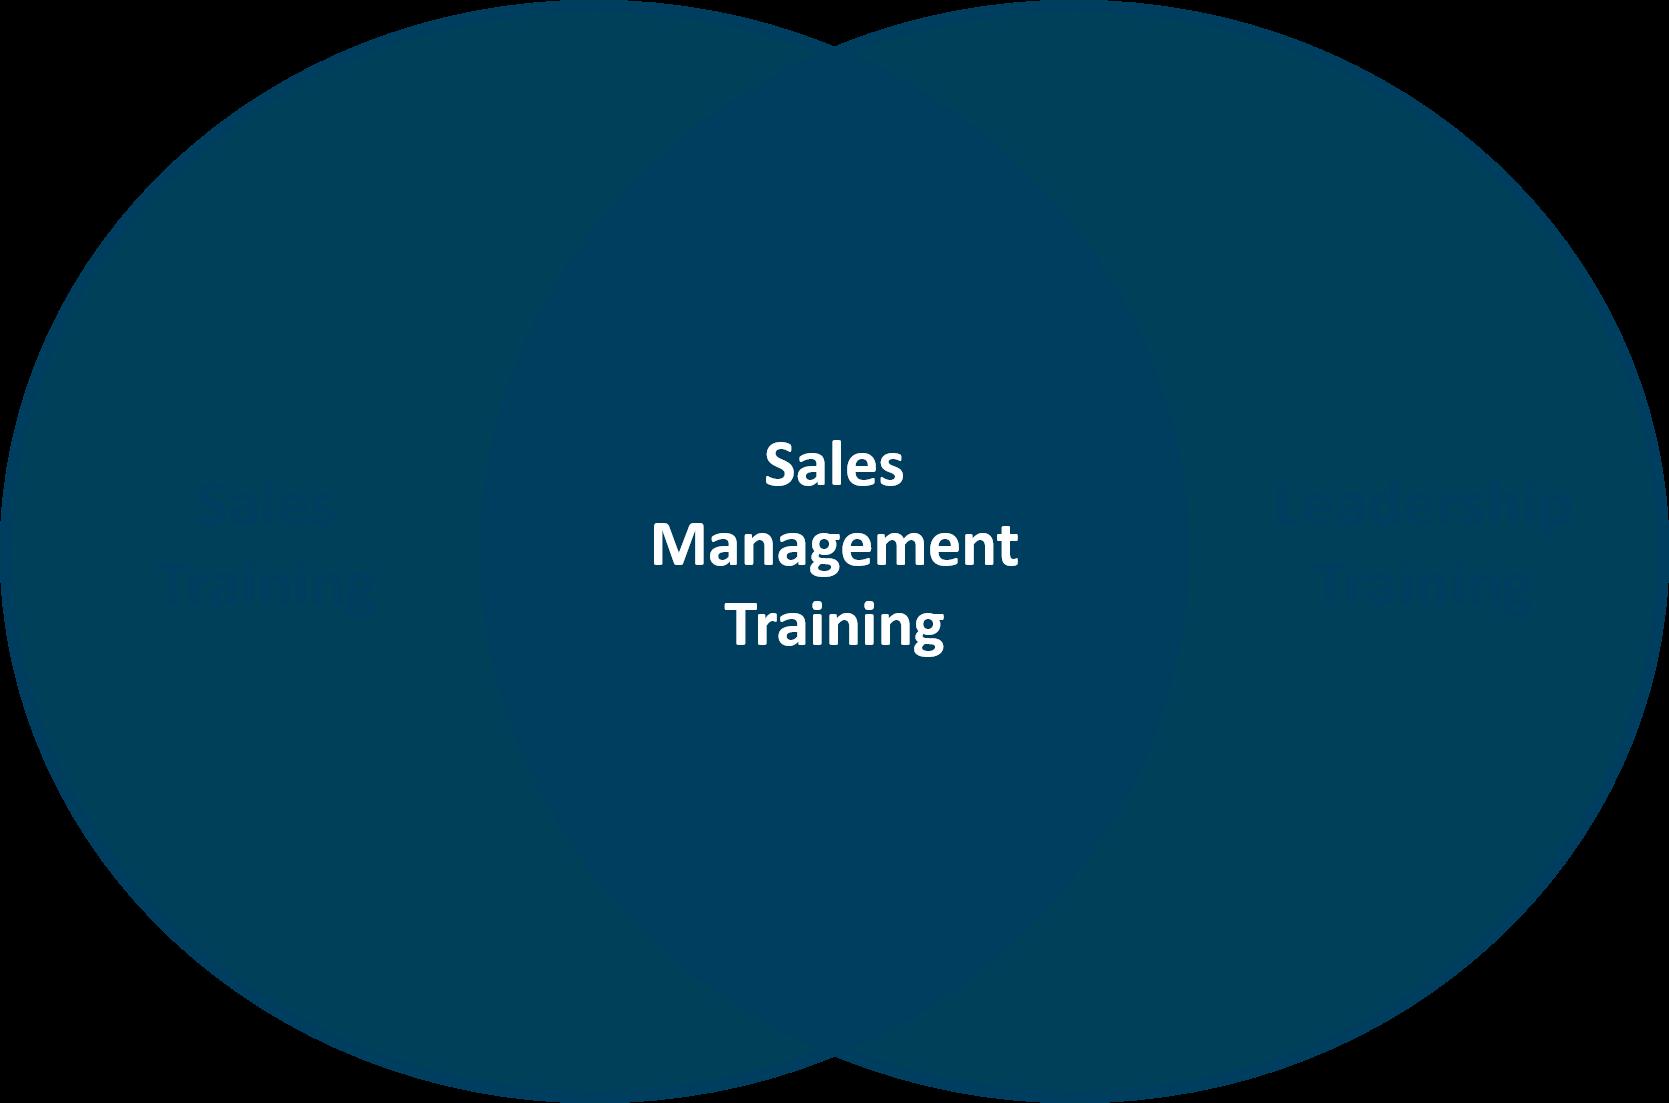 Sales management training skills gap